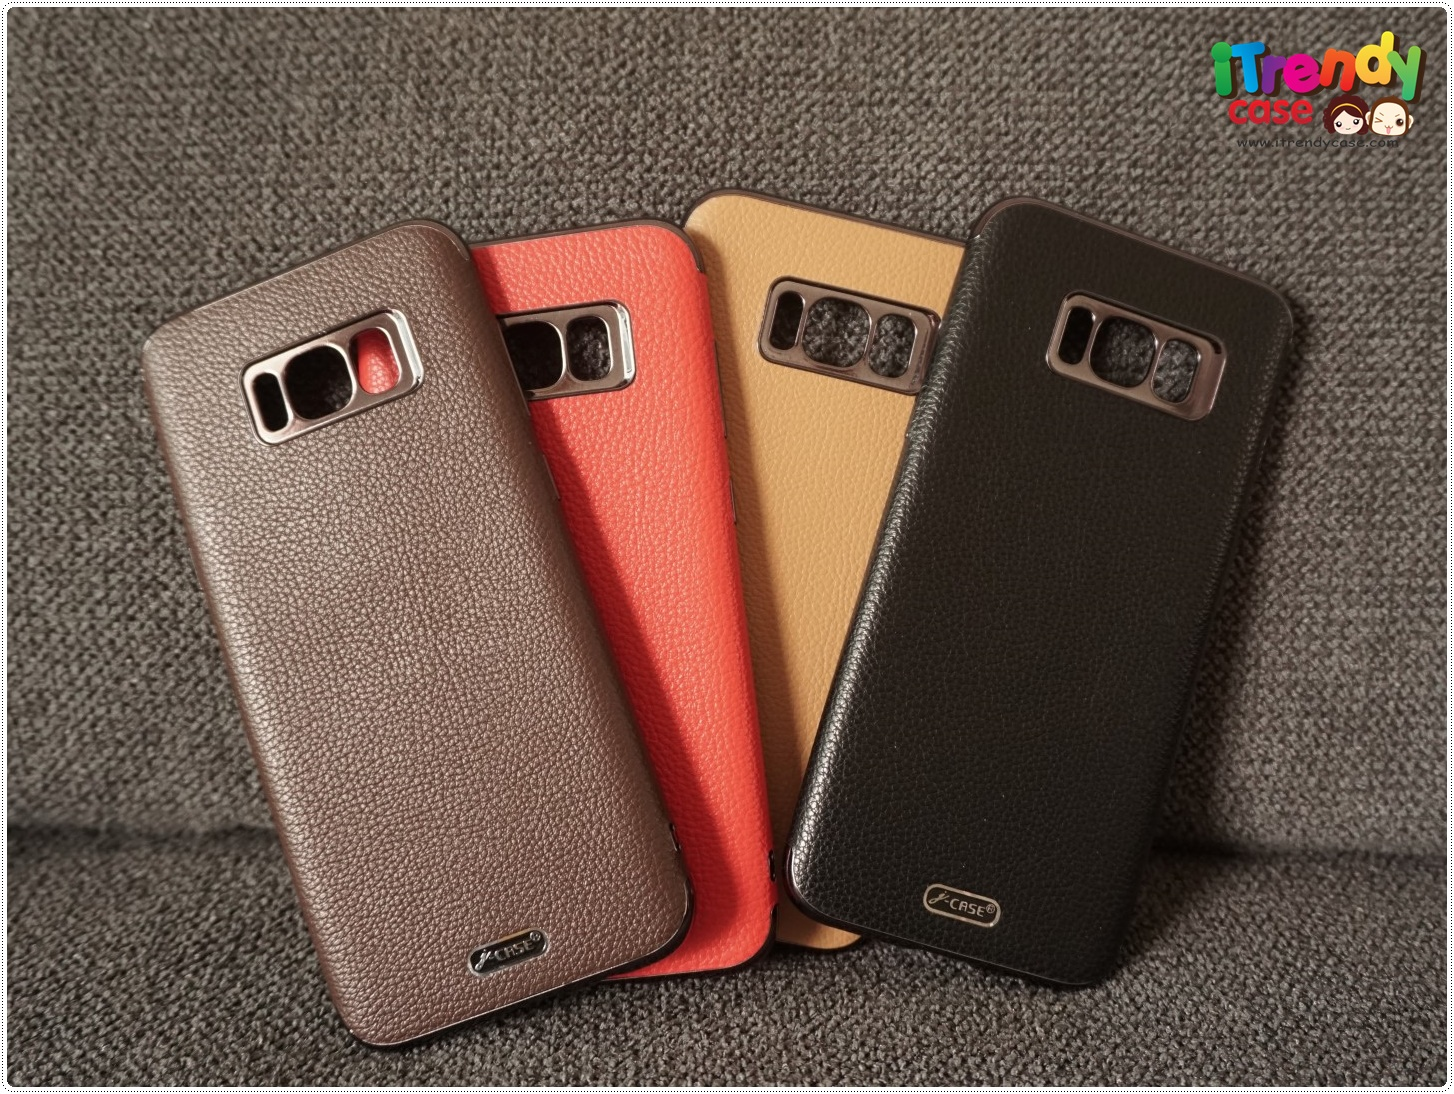 Samsung S8 - เคส TPU ลายหนัง J-CASE แท้